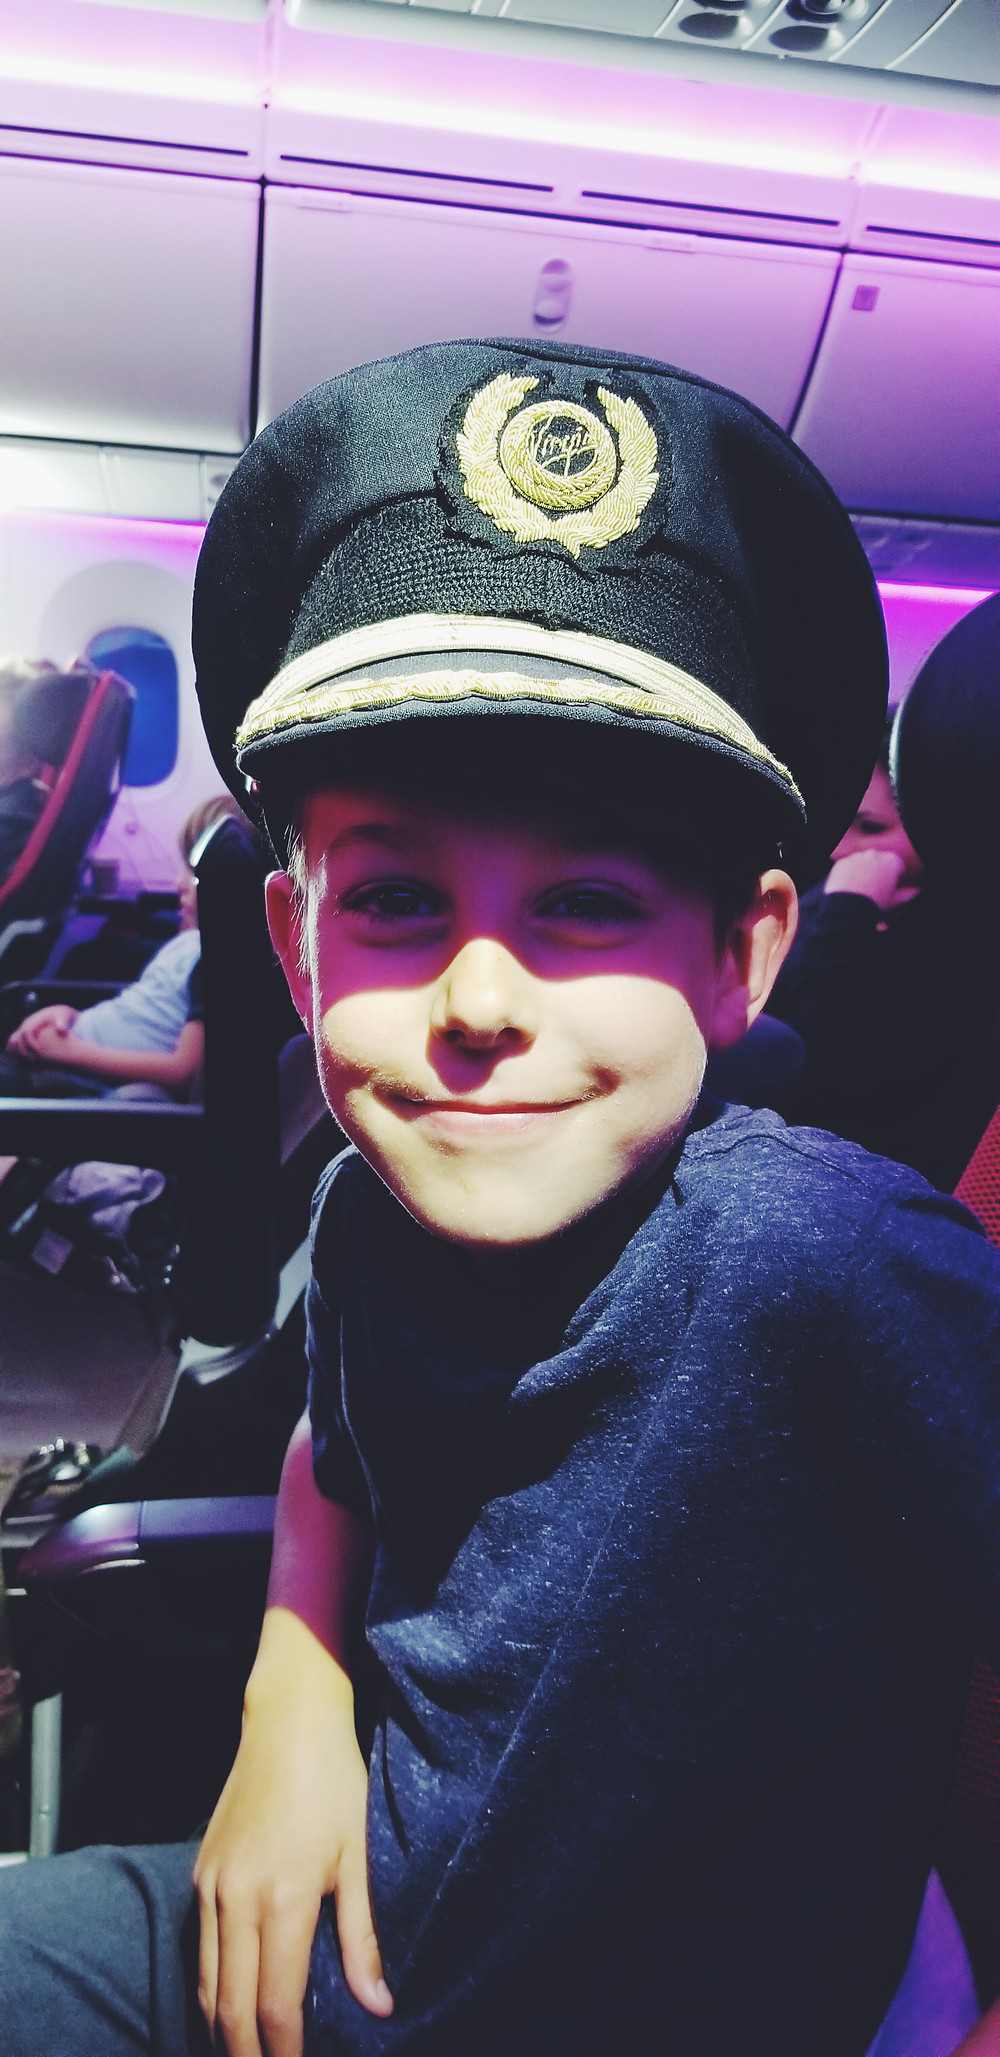 Virgin Atlantic Captains hat